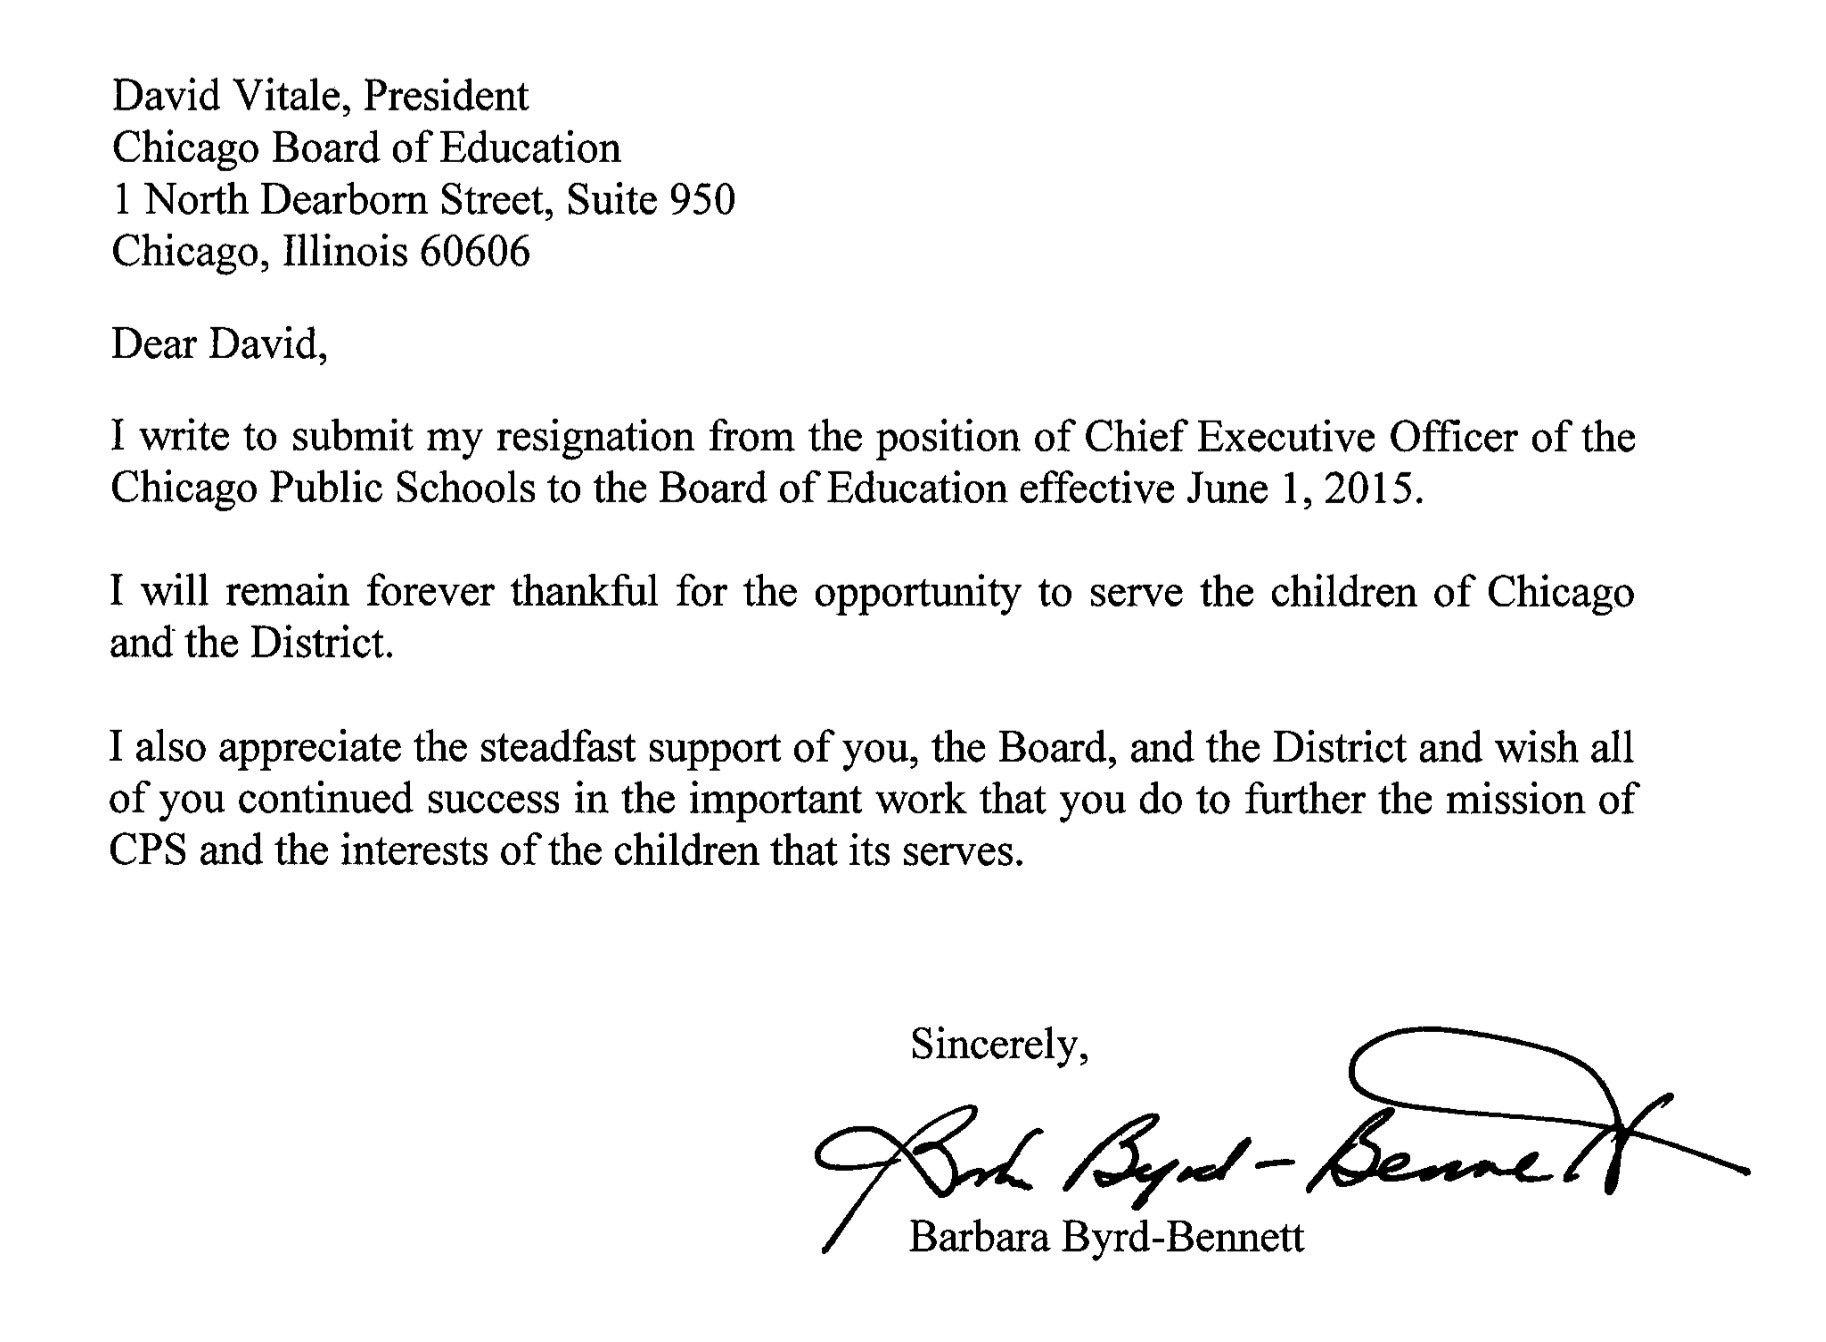 strong resignation letter – Strong Resignation Letter